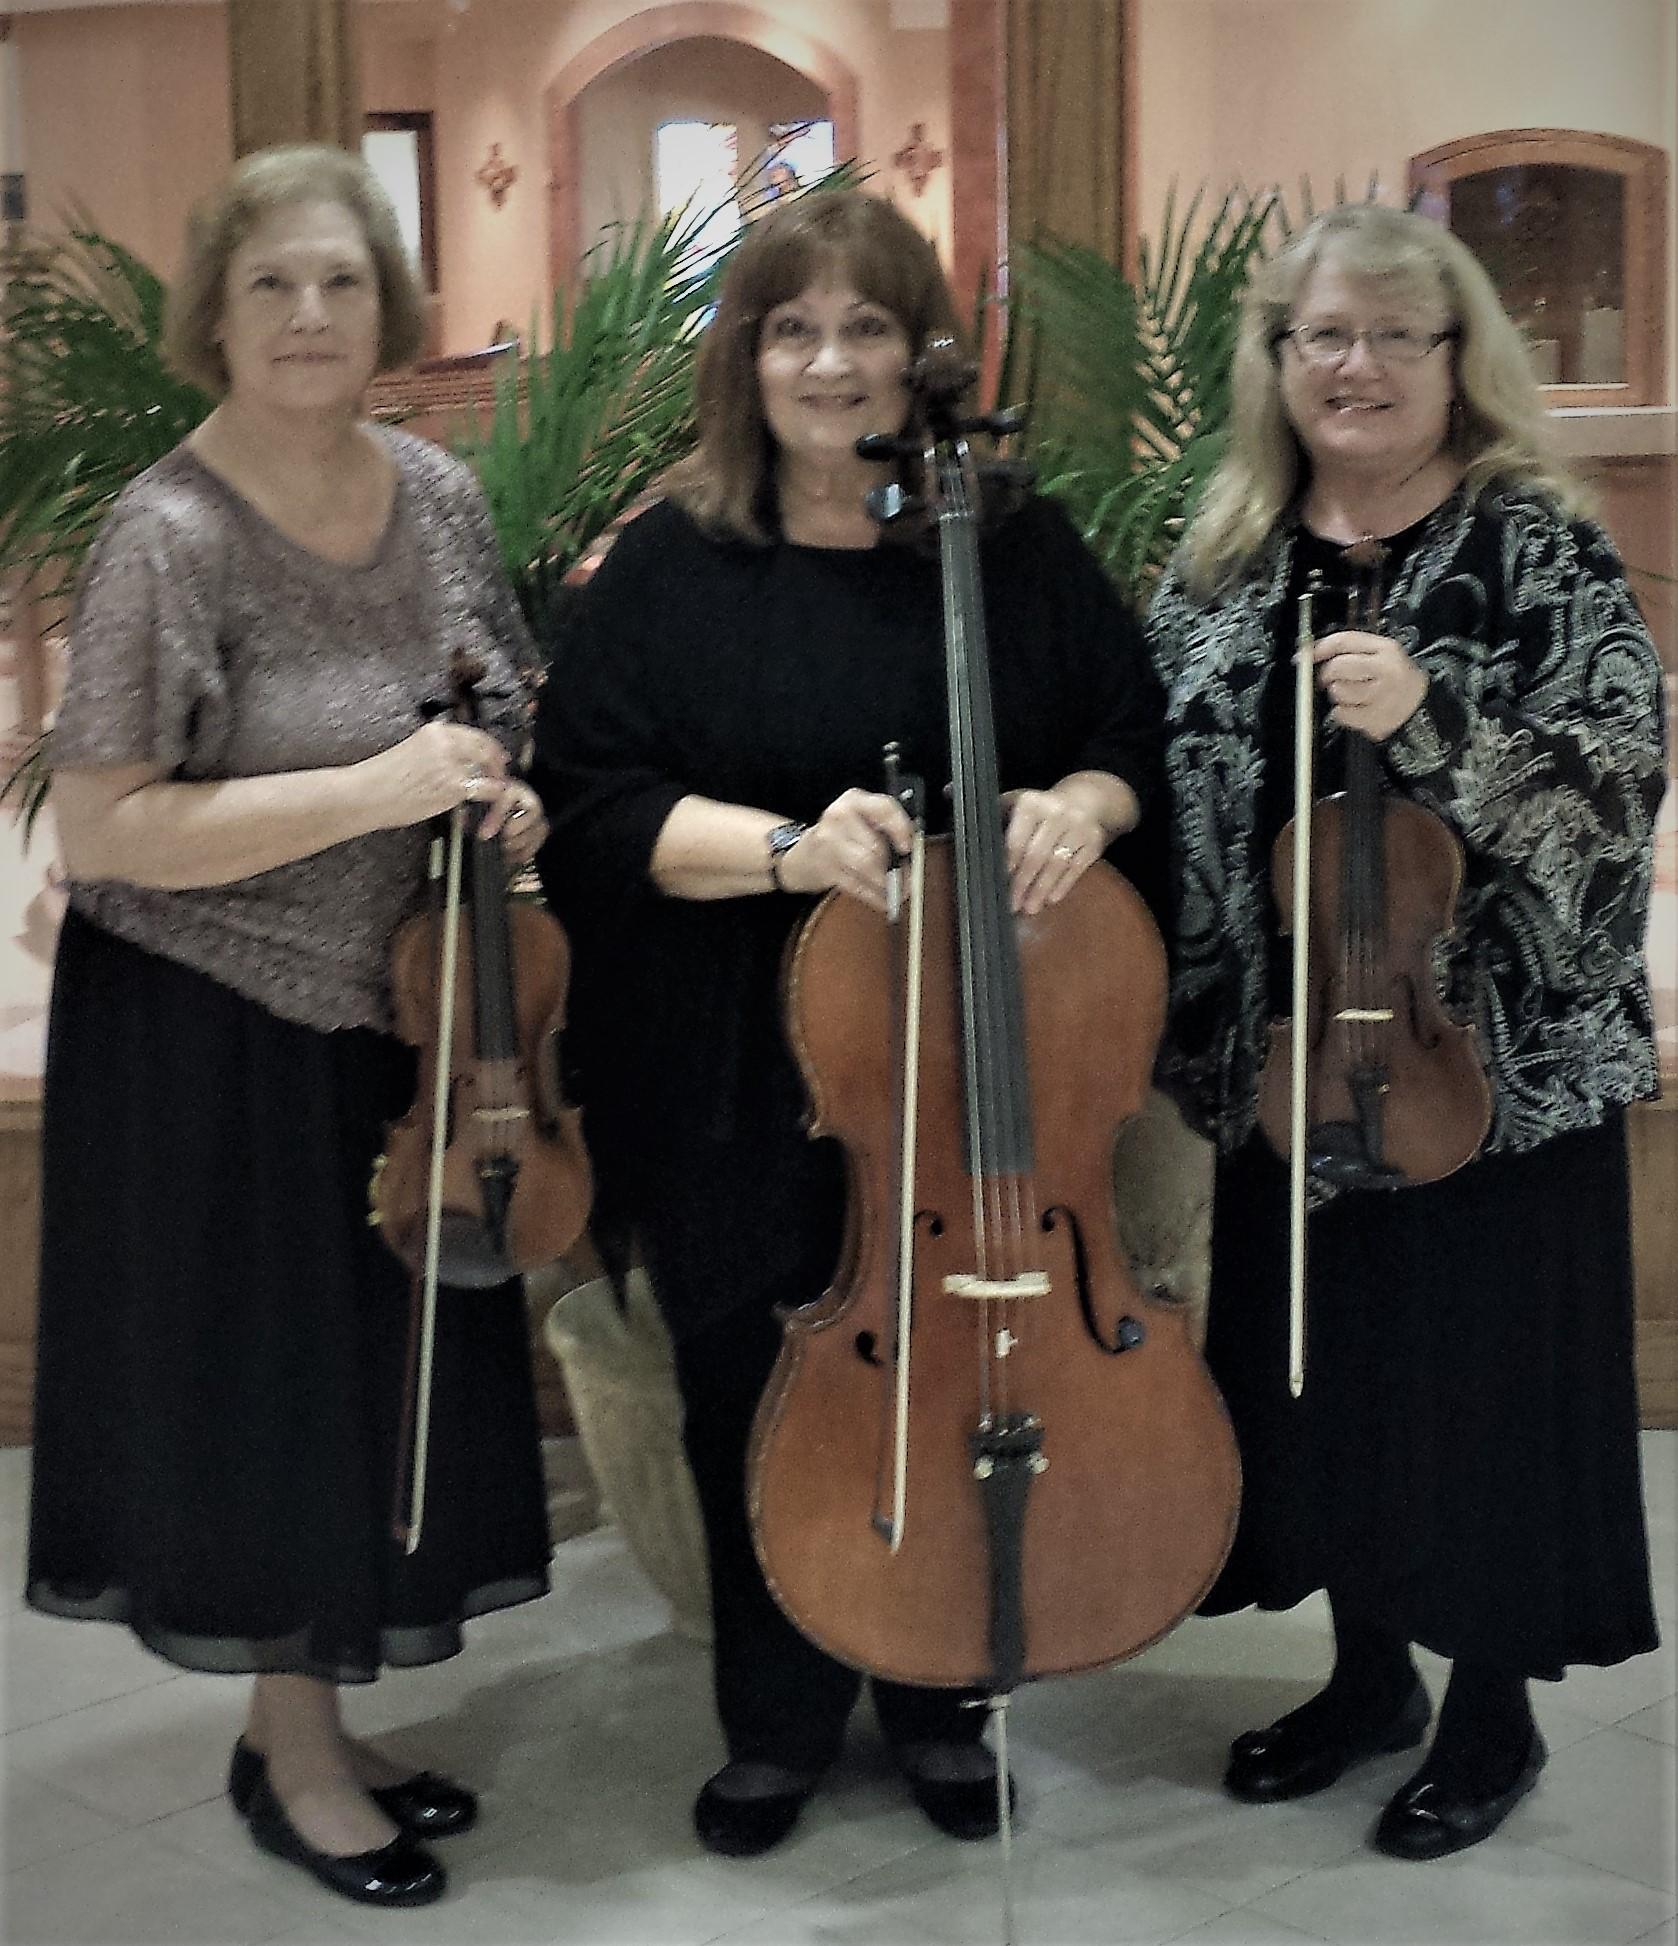 Trio at St. Paul the Apostle